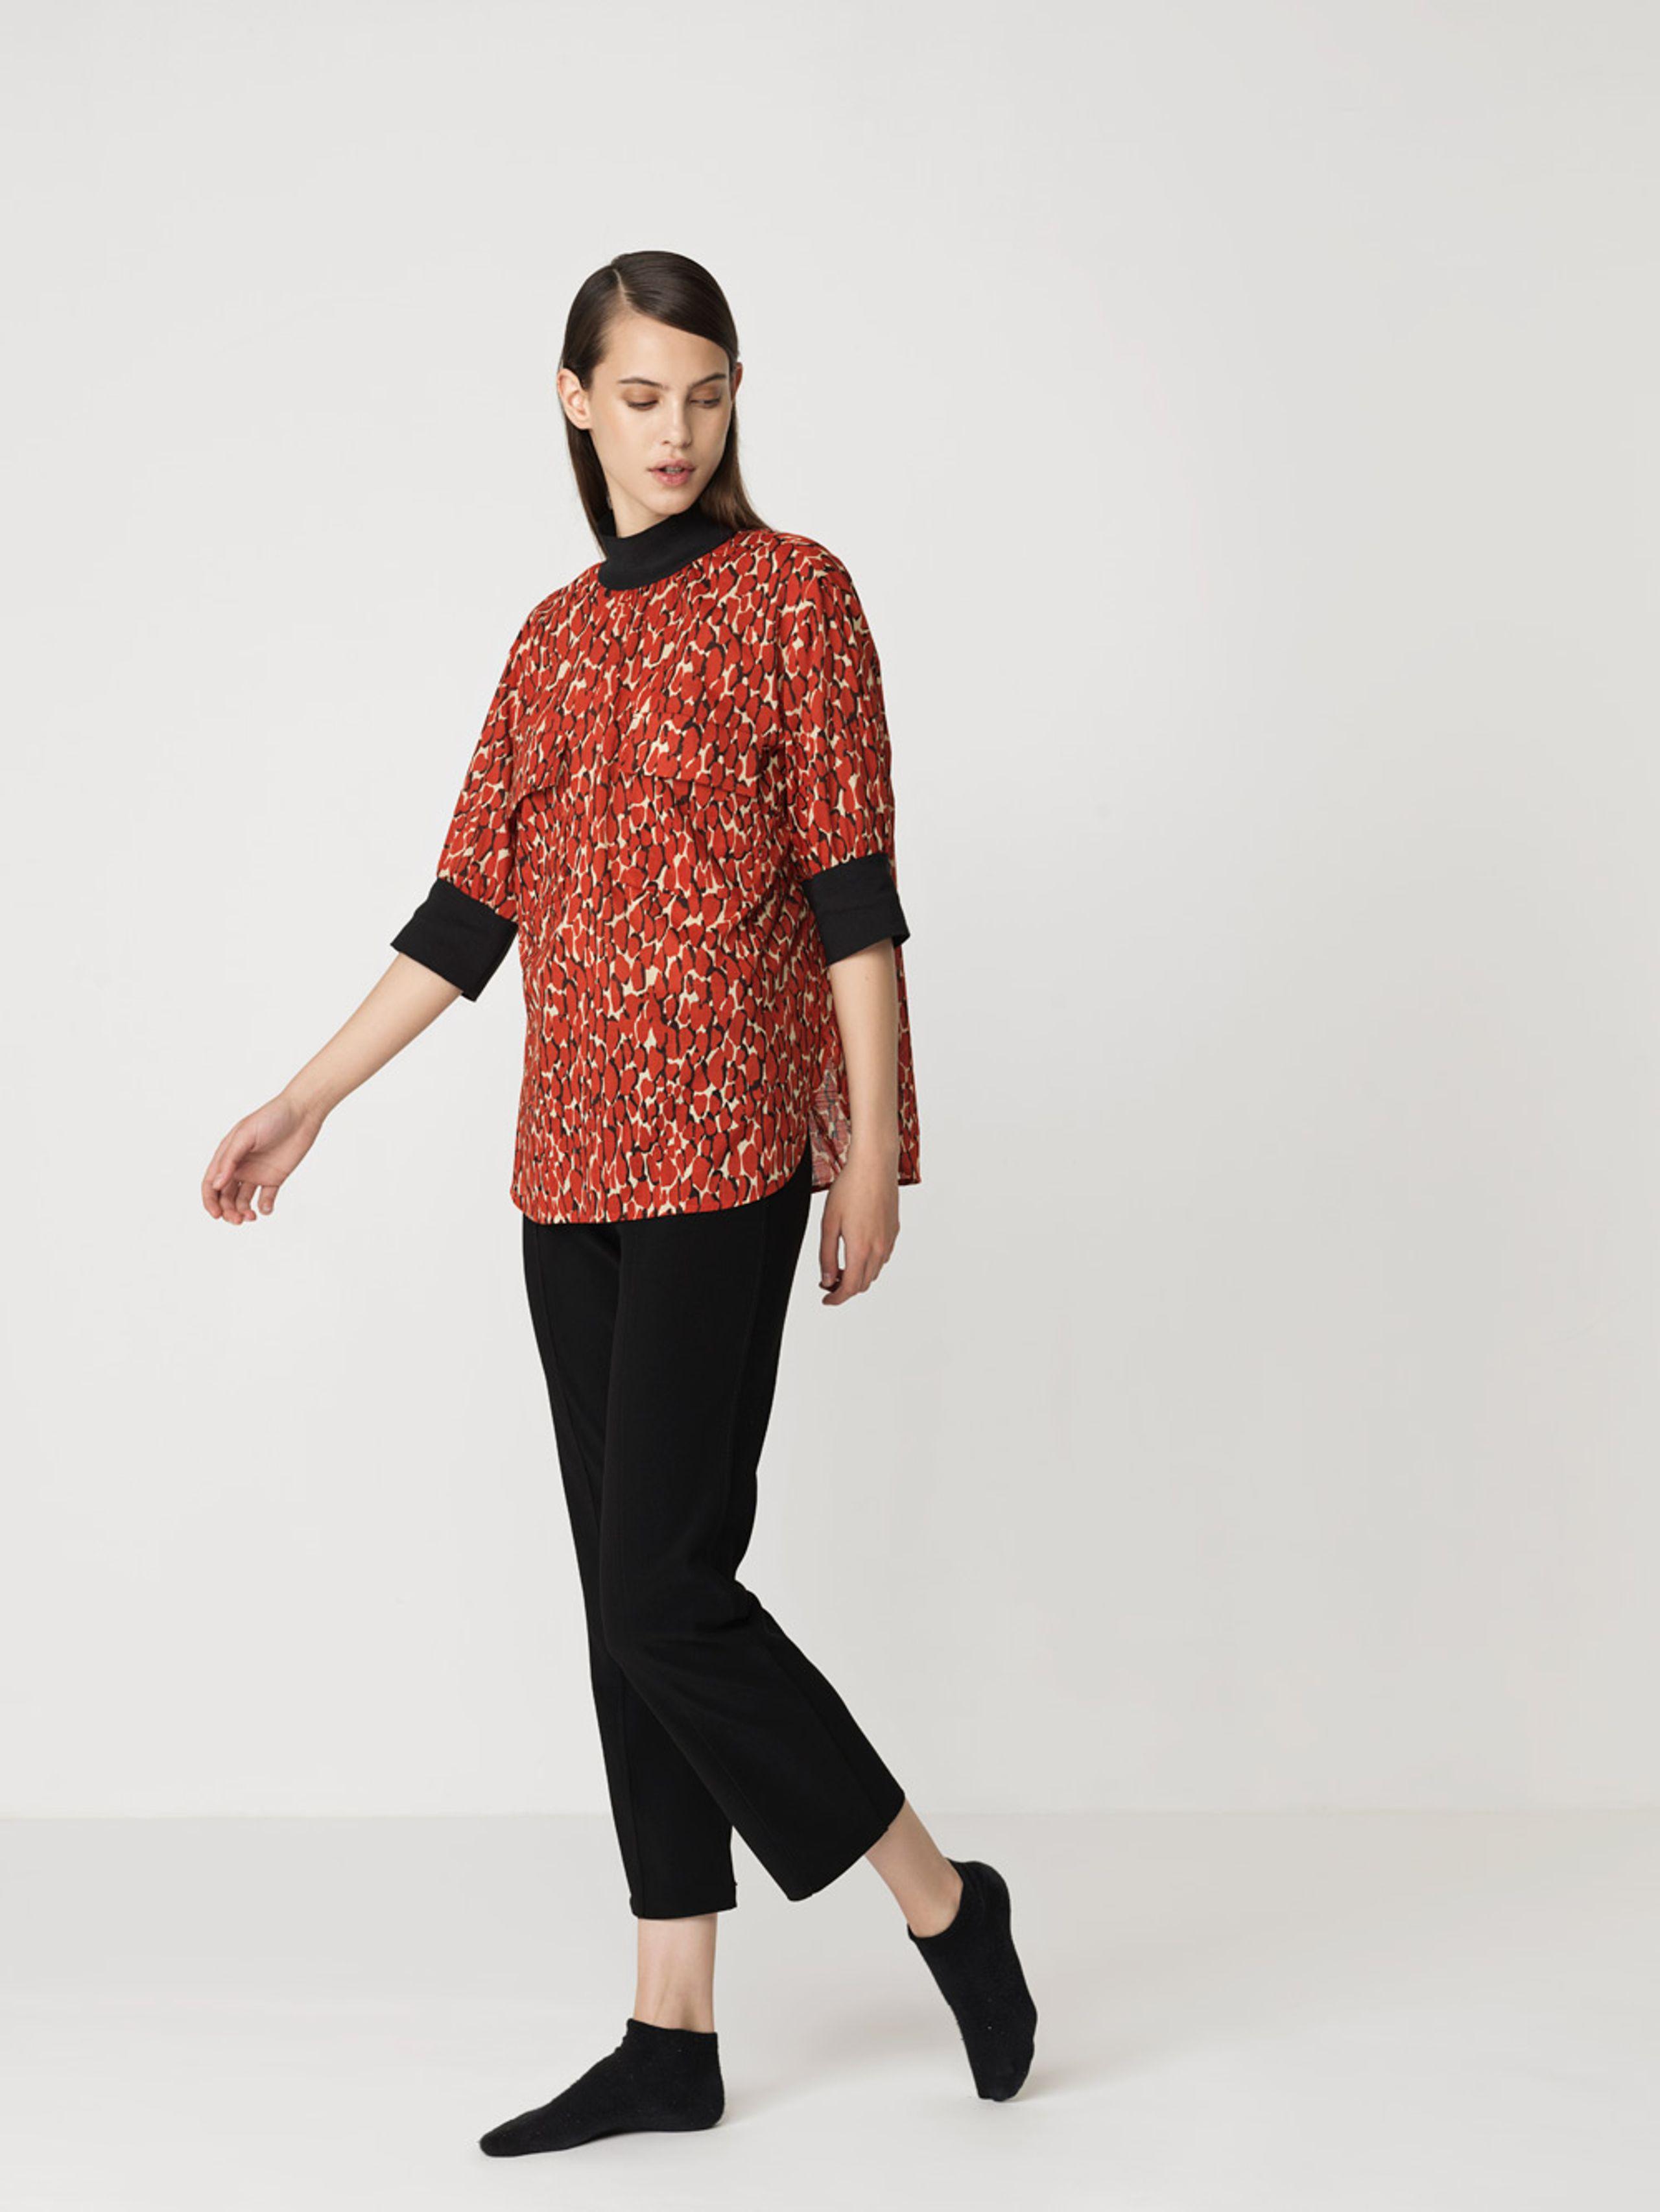 95f14a2f2ef ... By Malene Birger - T-shirt - Cobolias - Autumn Red